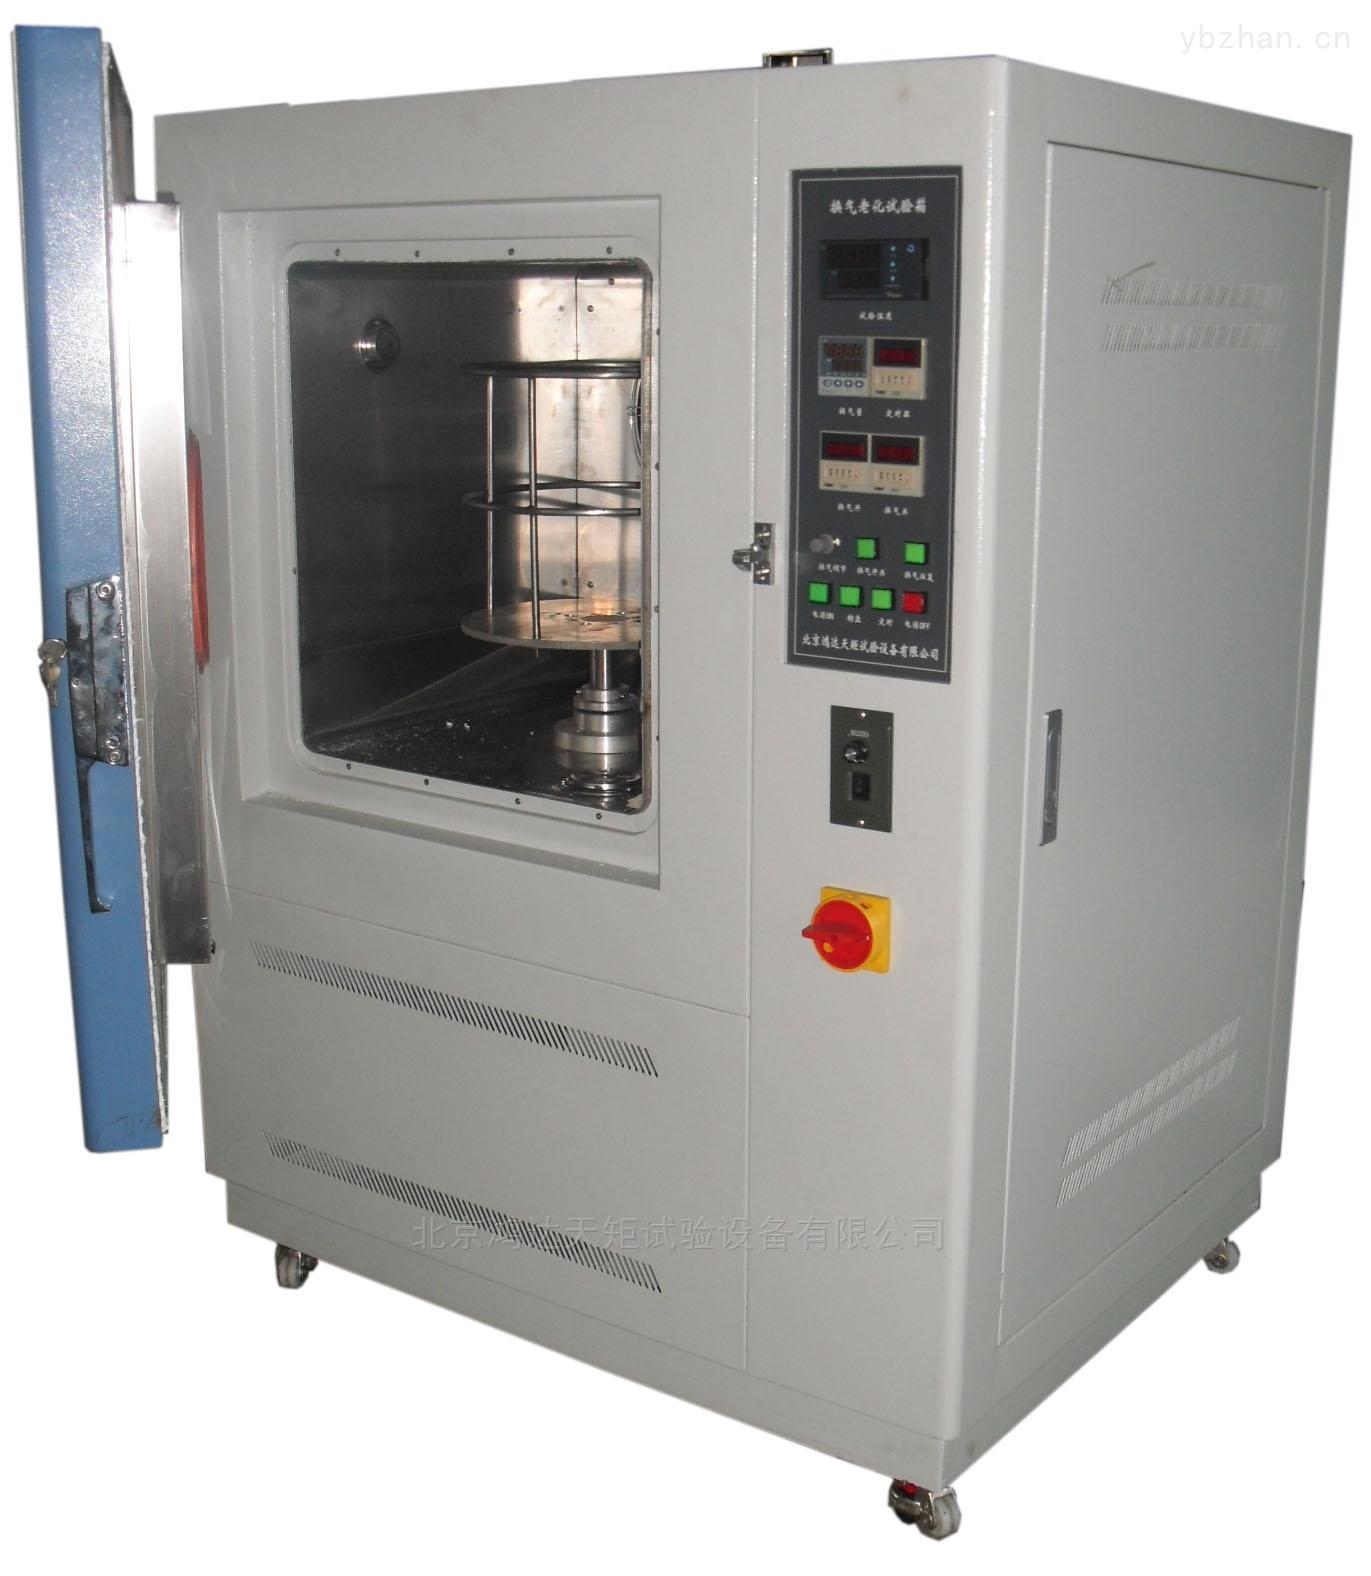 HT/QLH-225-换气式高温老化试验箱直销价